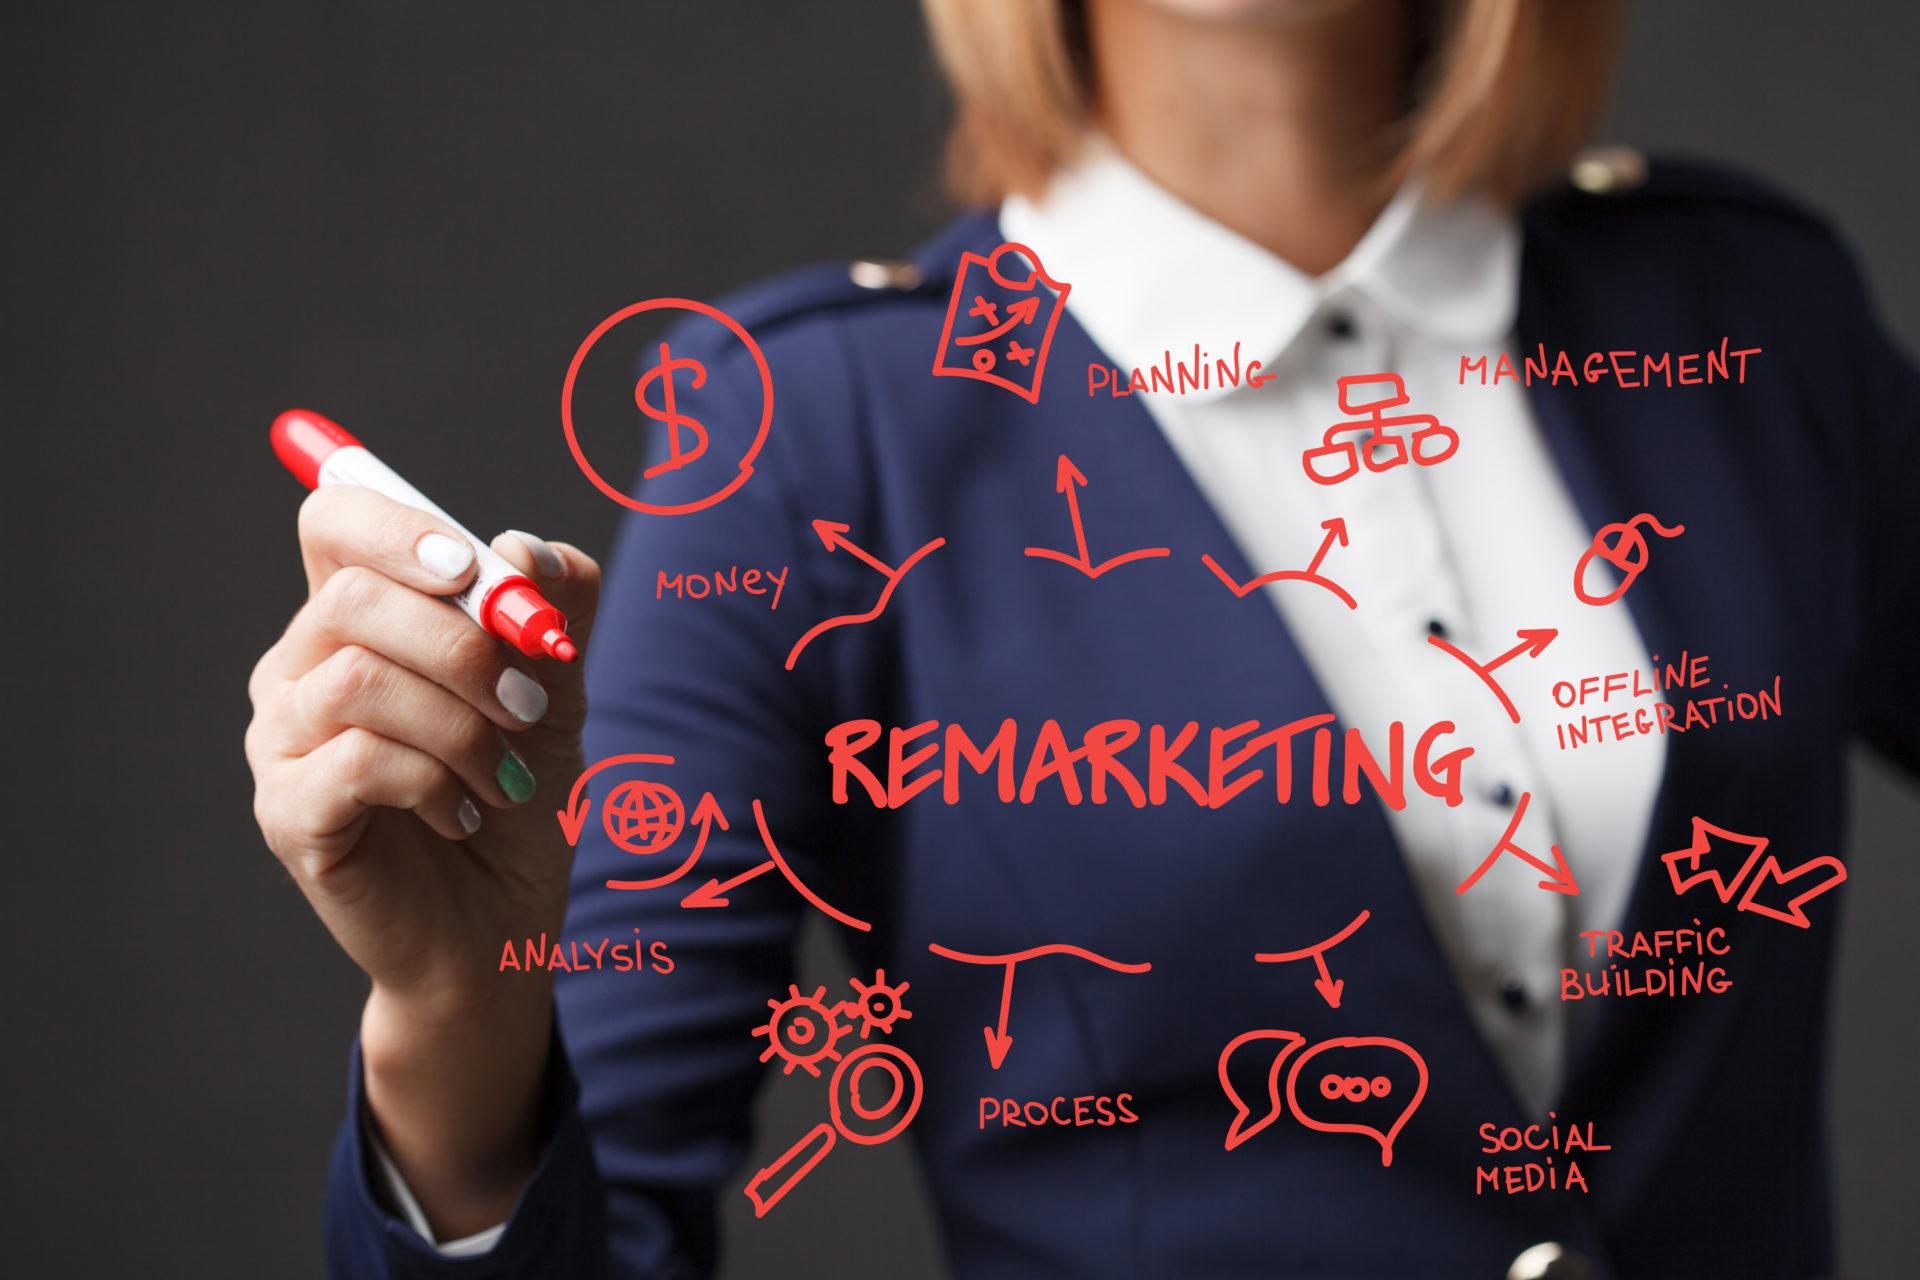 Remarketing-Retargeting-Paid-Ads